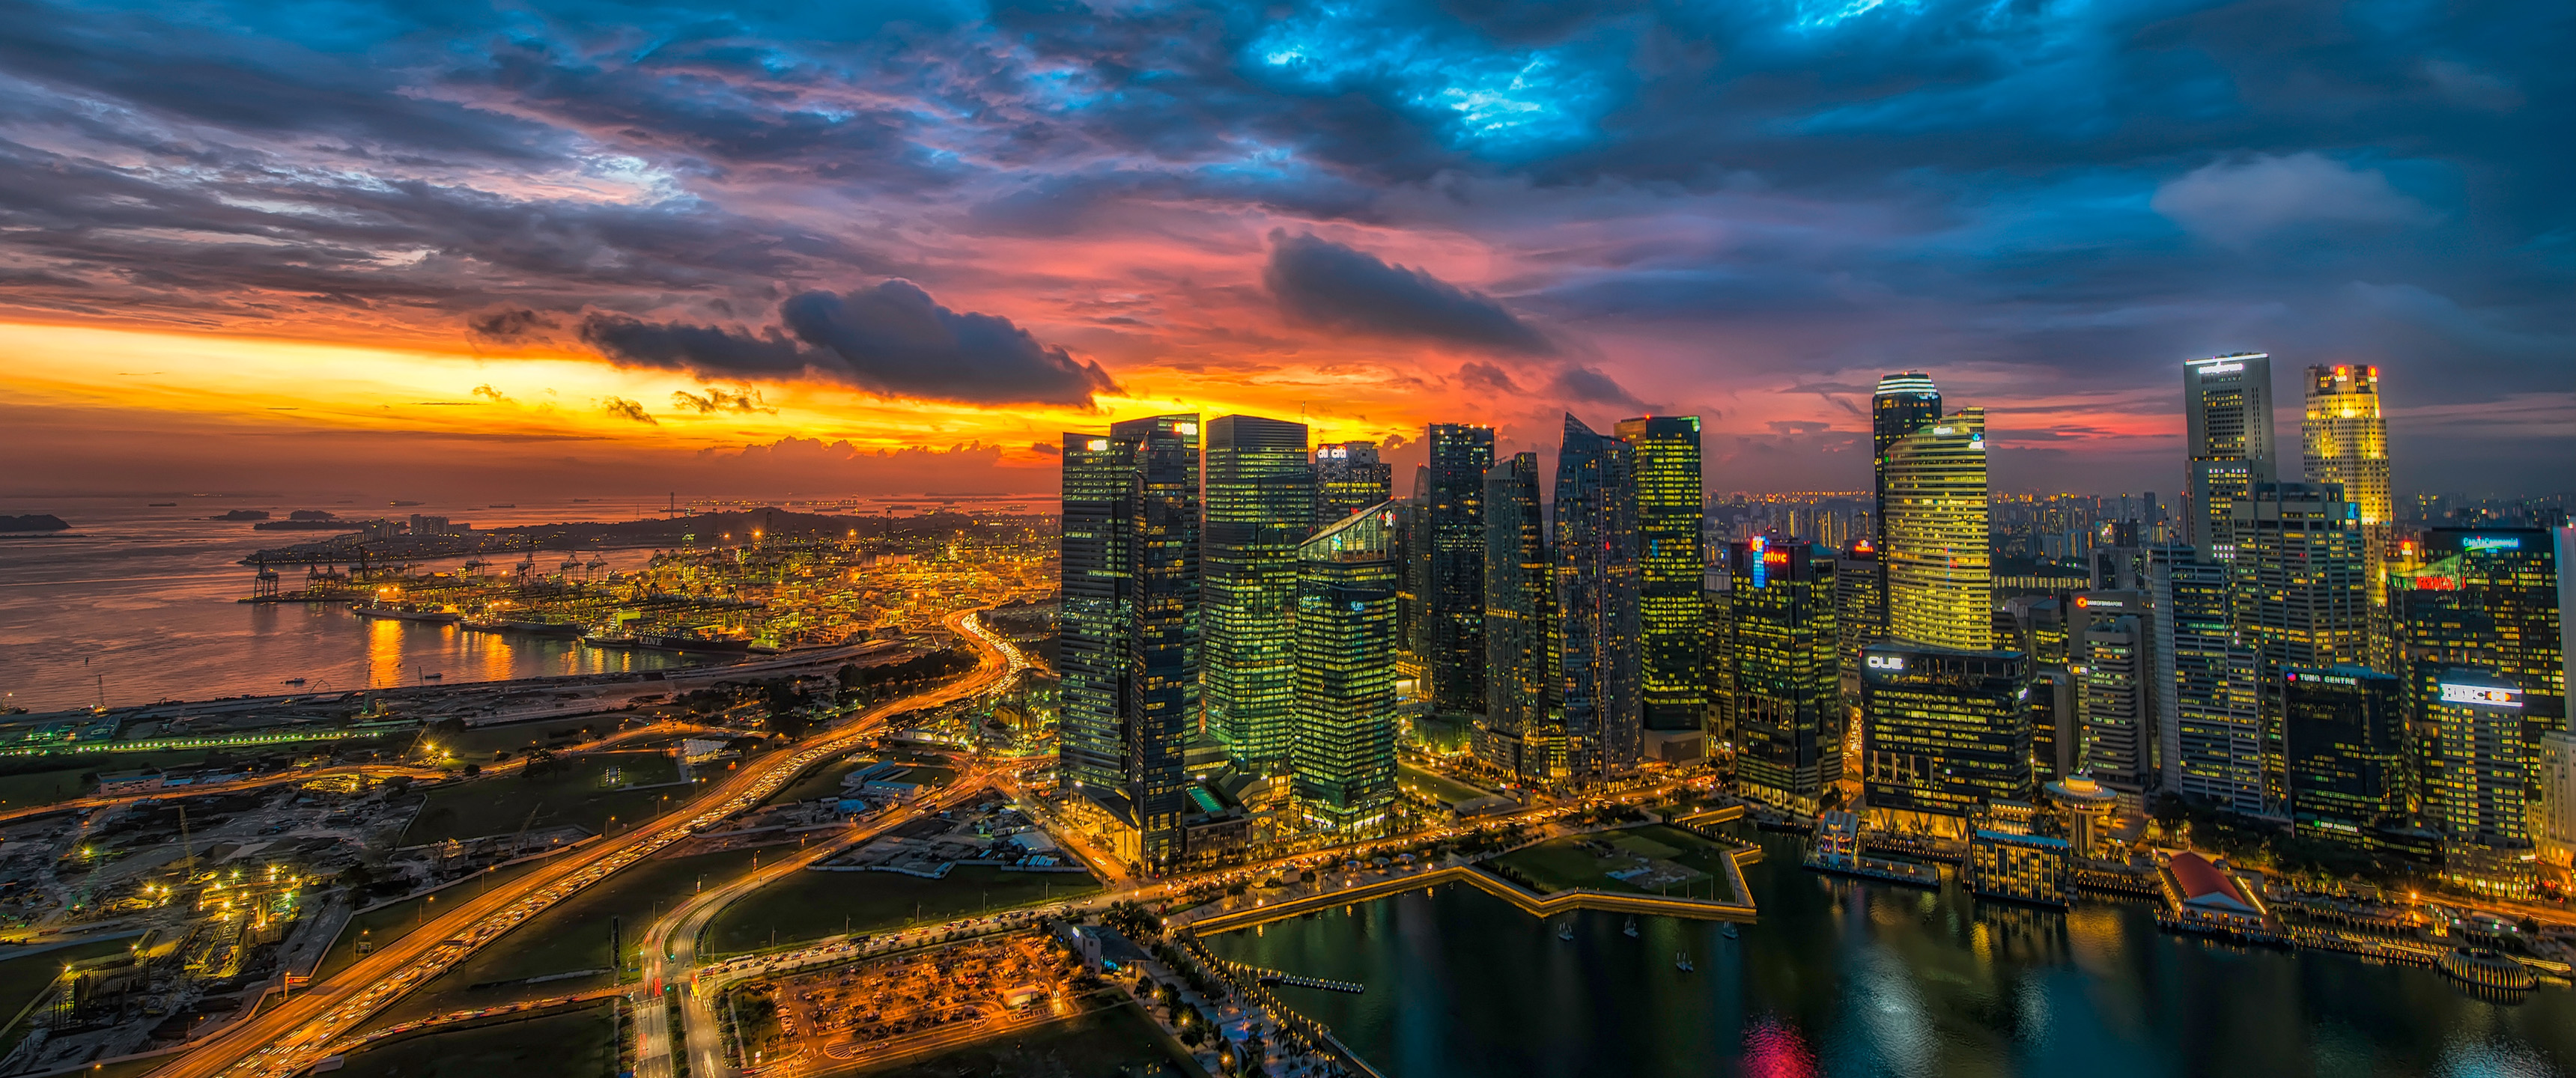 Glowing Singapore 219 Wallpaper Ultrawide Monitor 219 Wallpapers 3440x1440